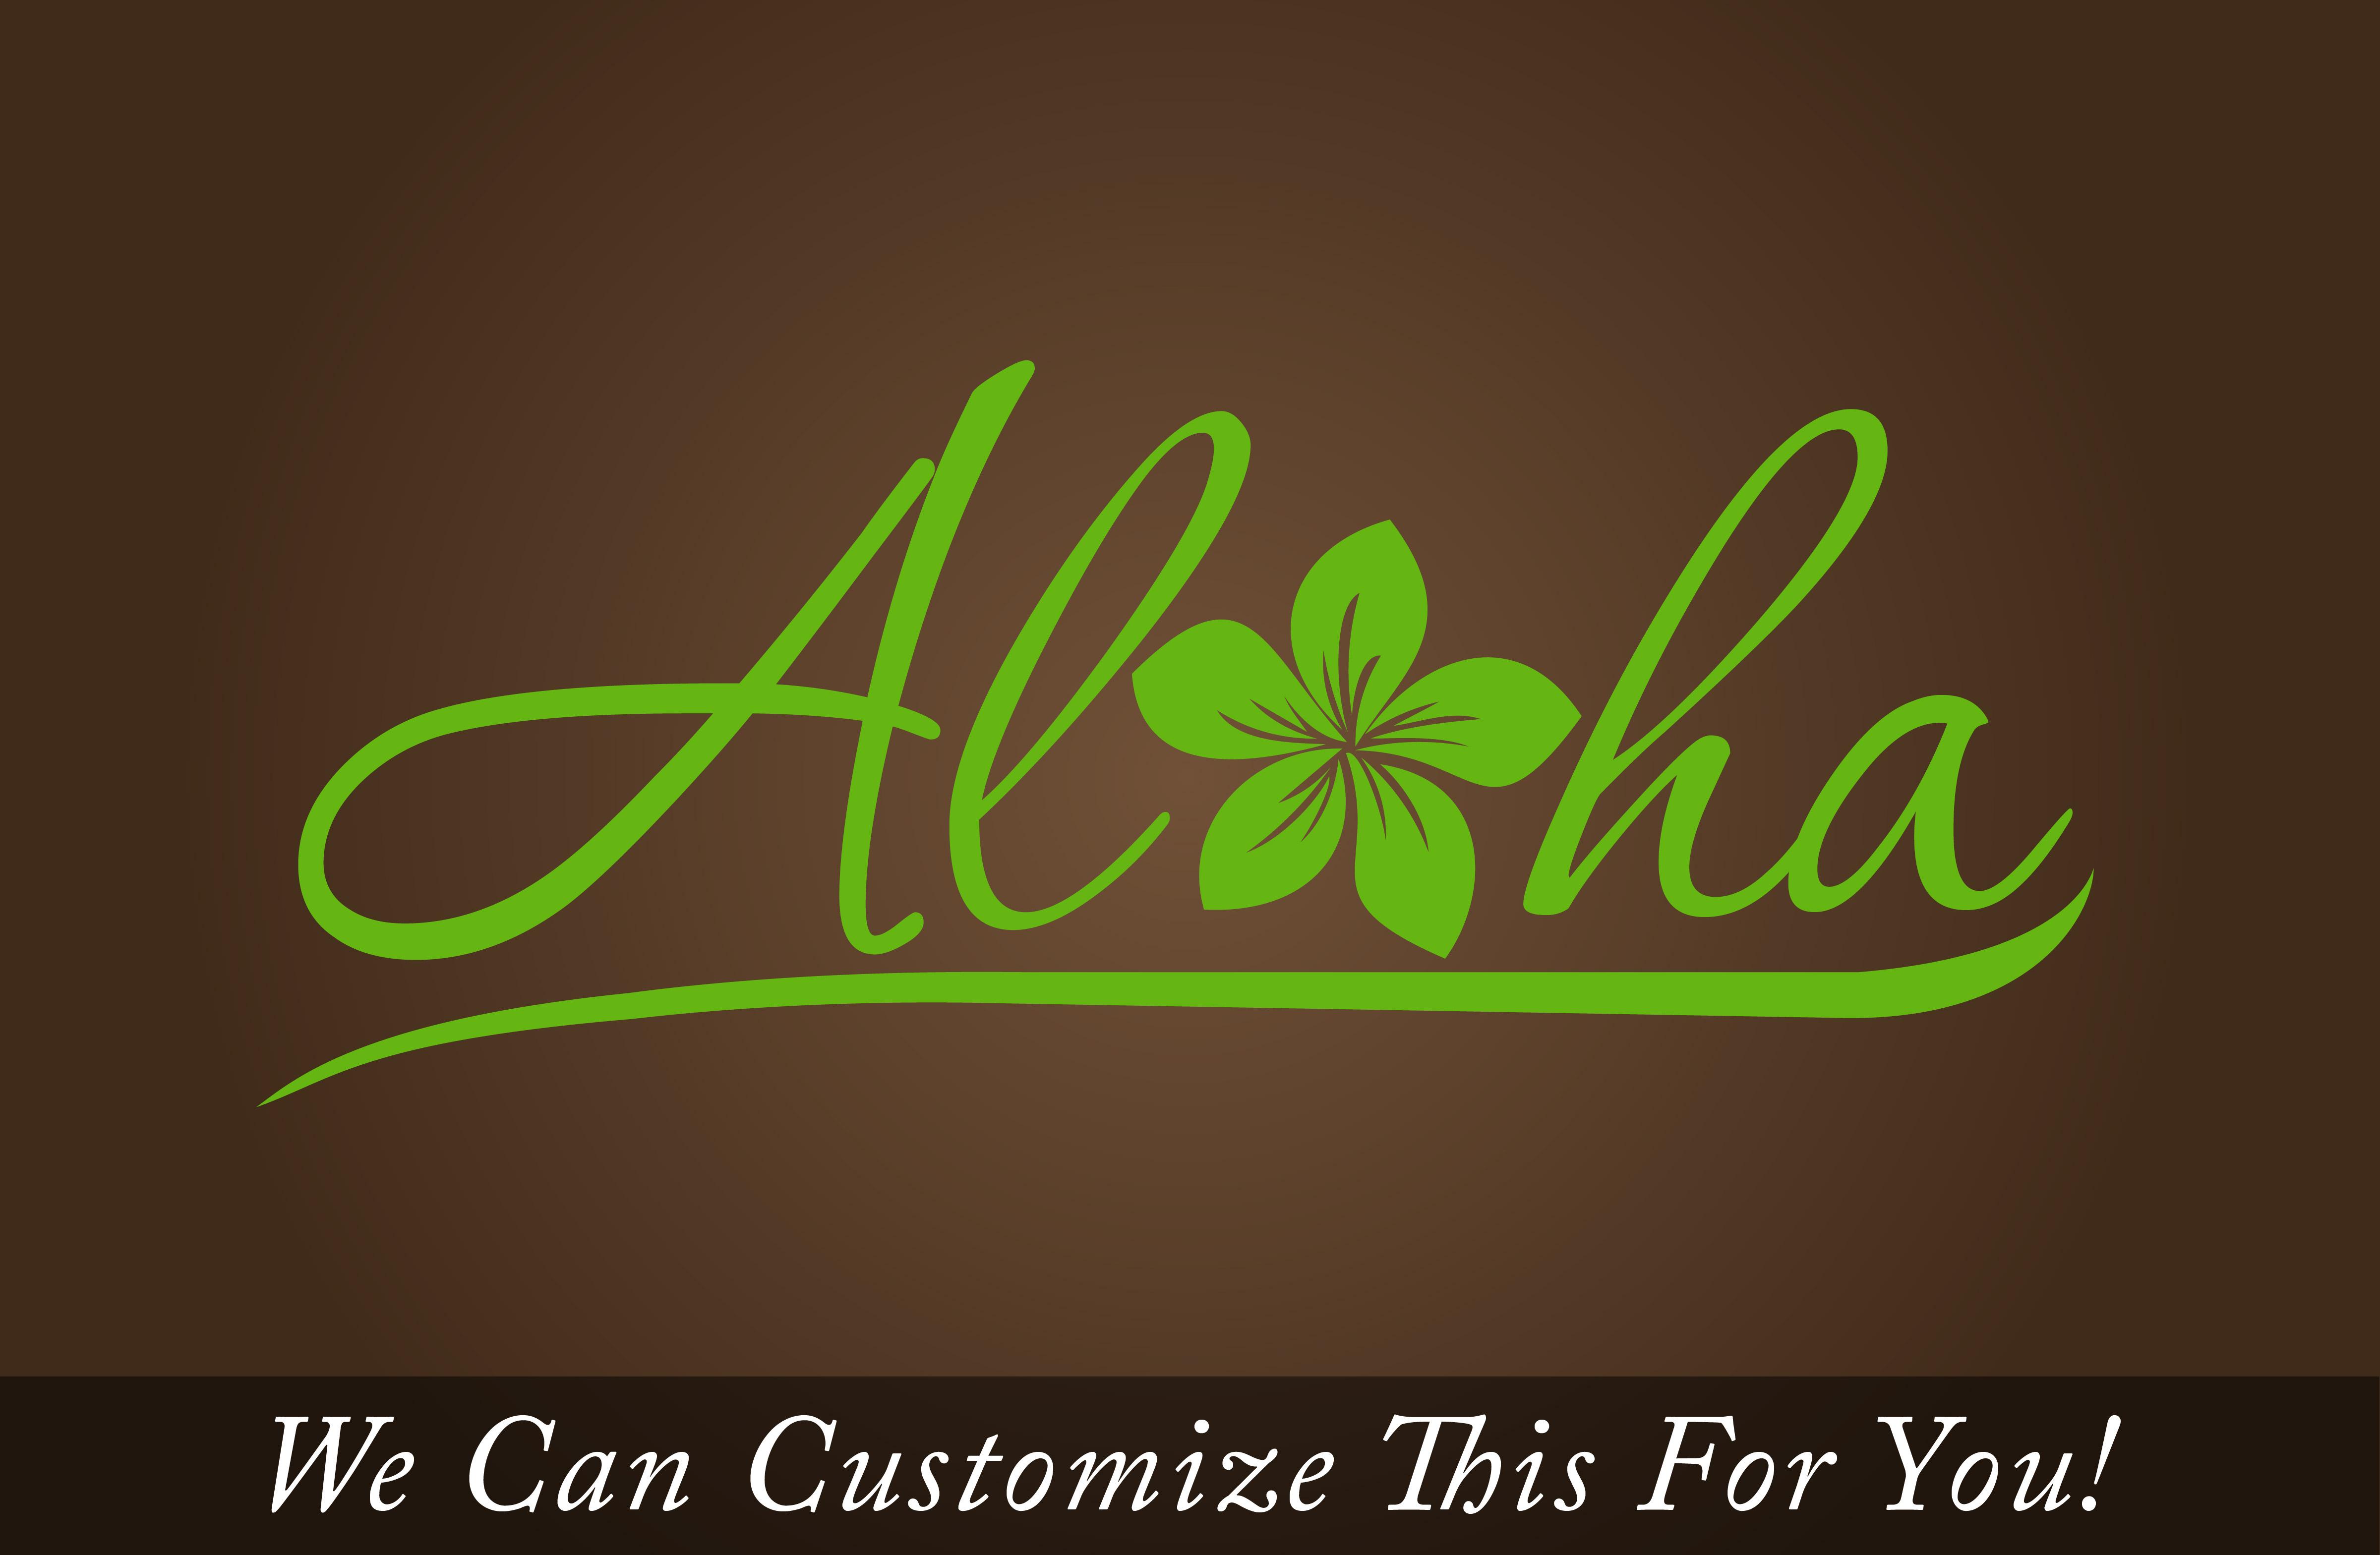 Aloha plumeria Hawaii door decor wall vinyl lettering decal with tropic  flower monogram medium 2070